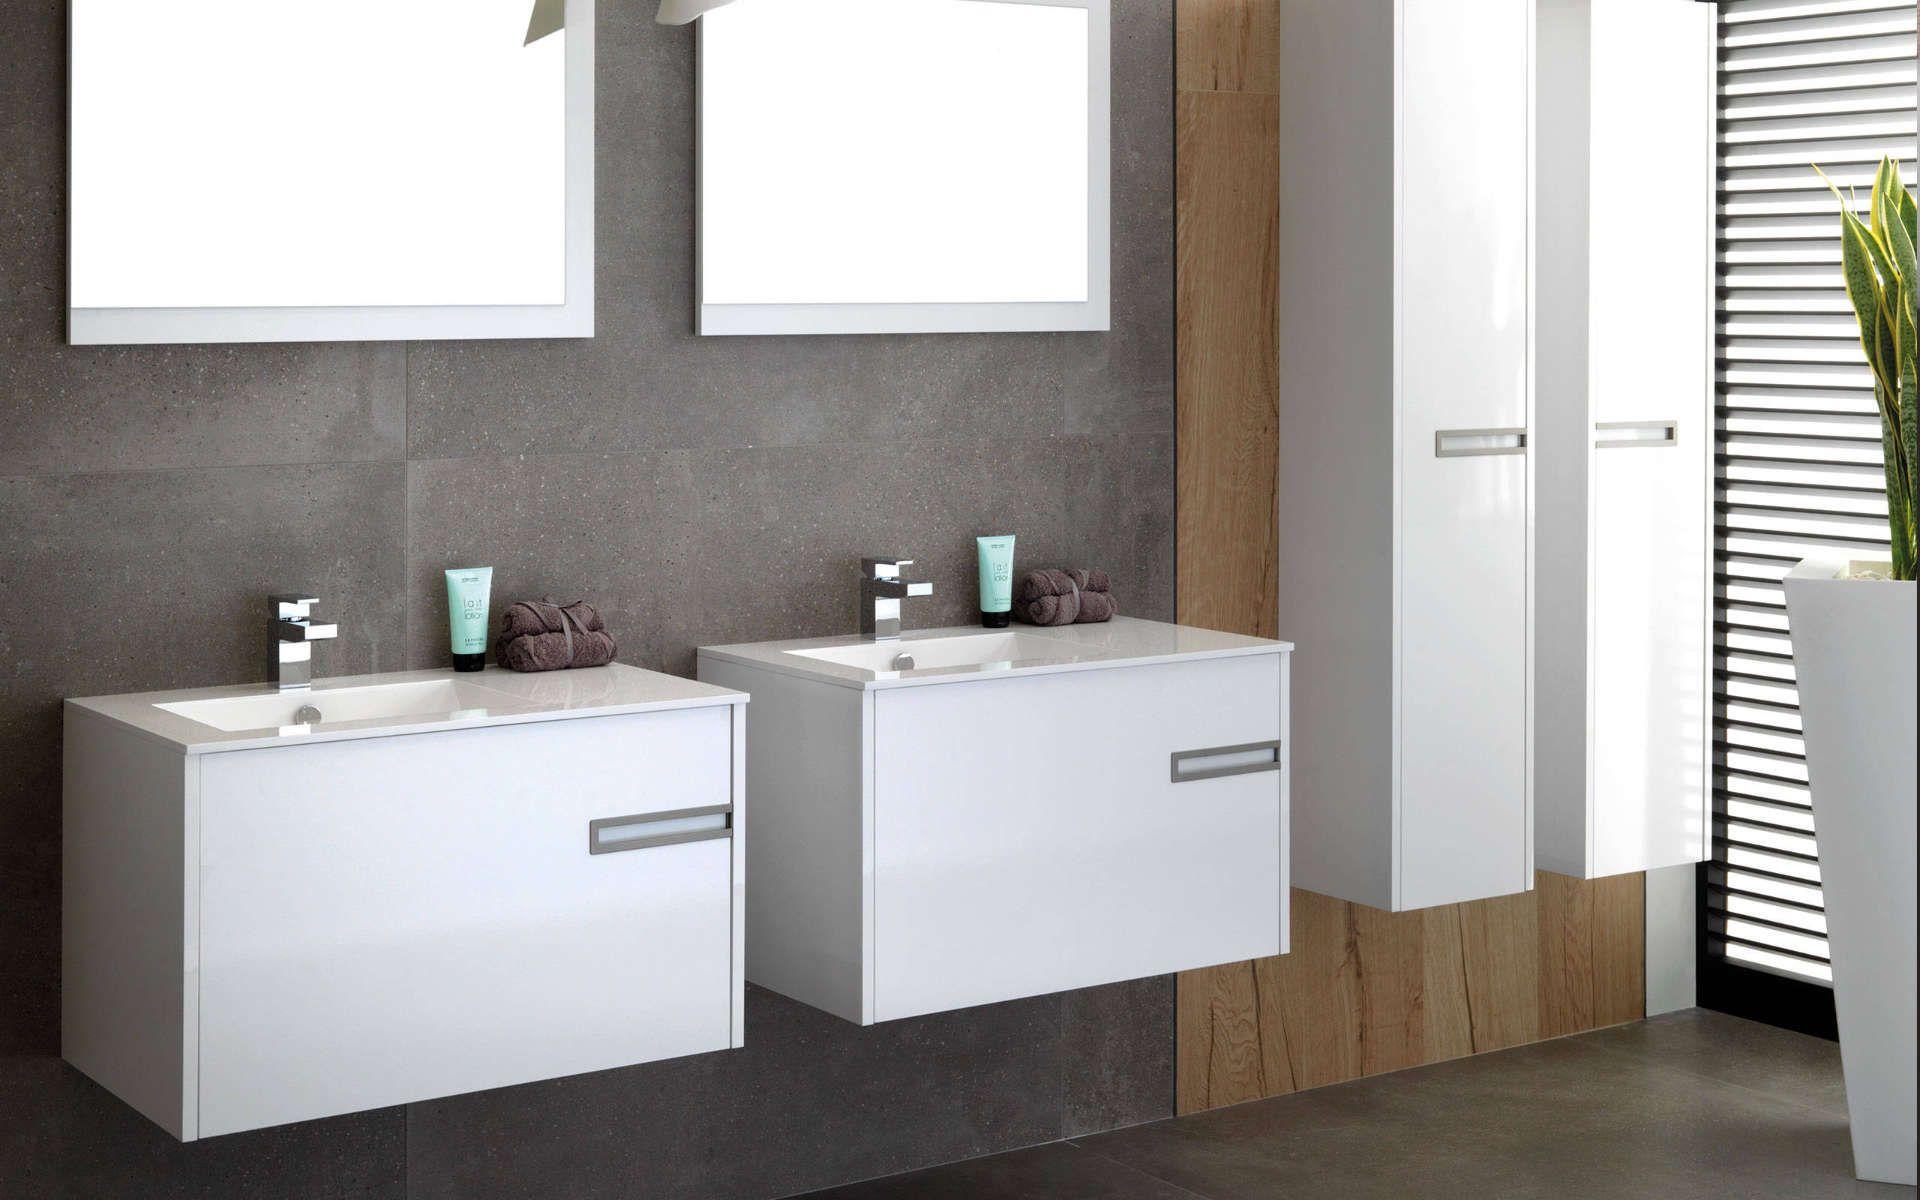 Mobilier De Salle De Bain Meubles De Salle De Bain Porcelanosa Vanity Bathroom Vanity Bathroom